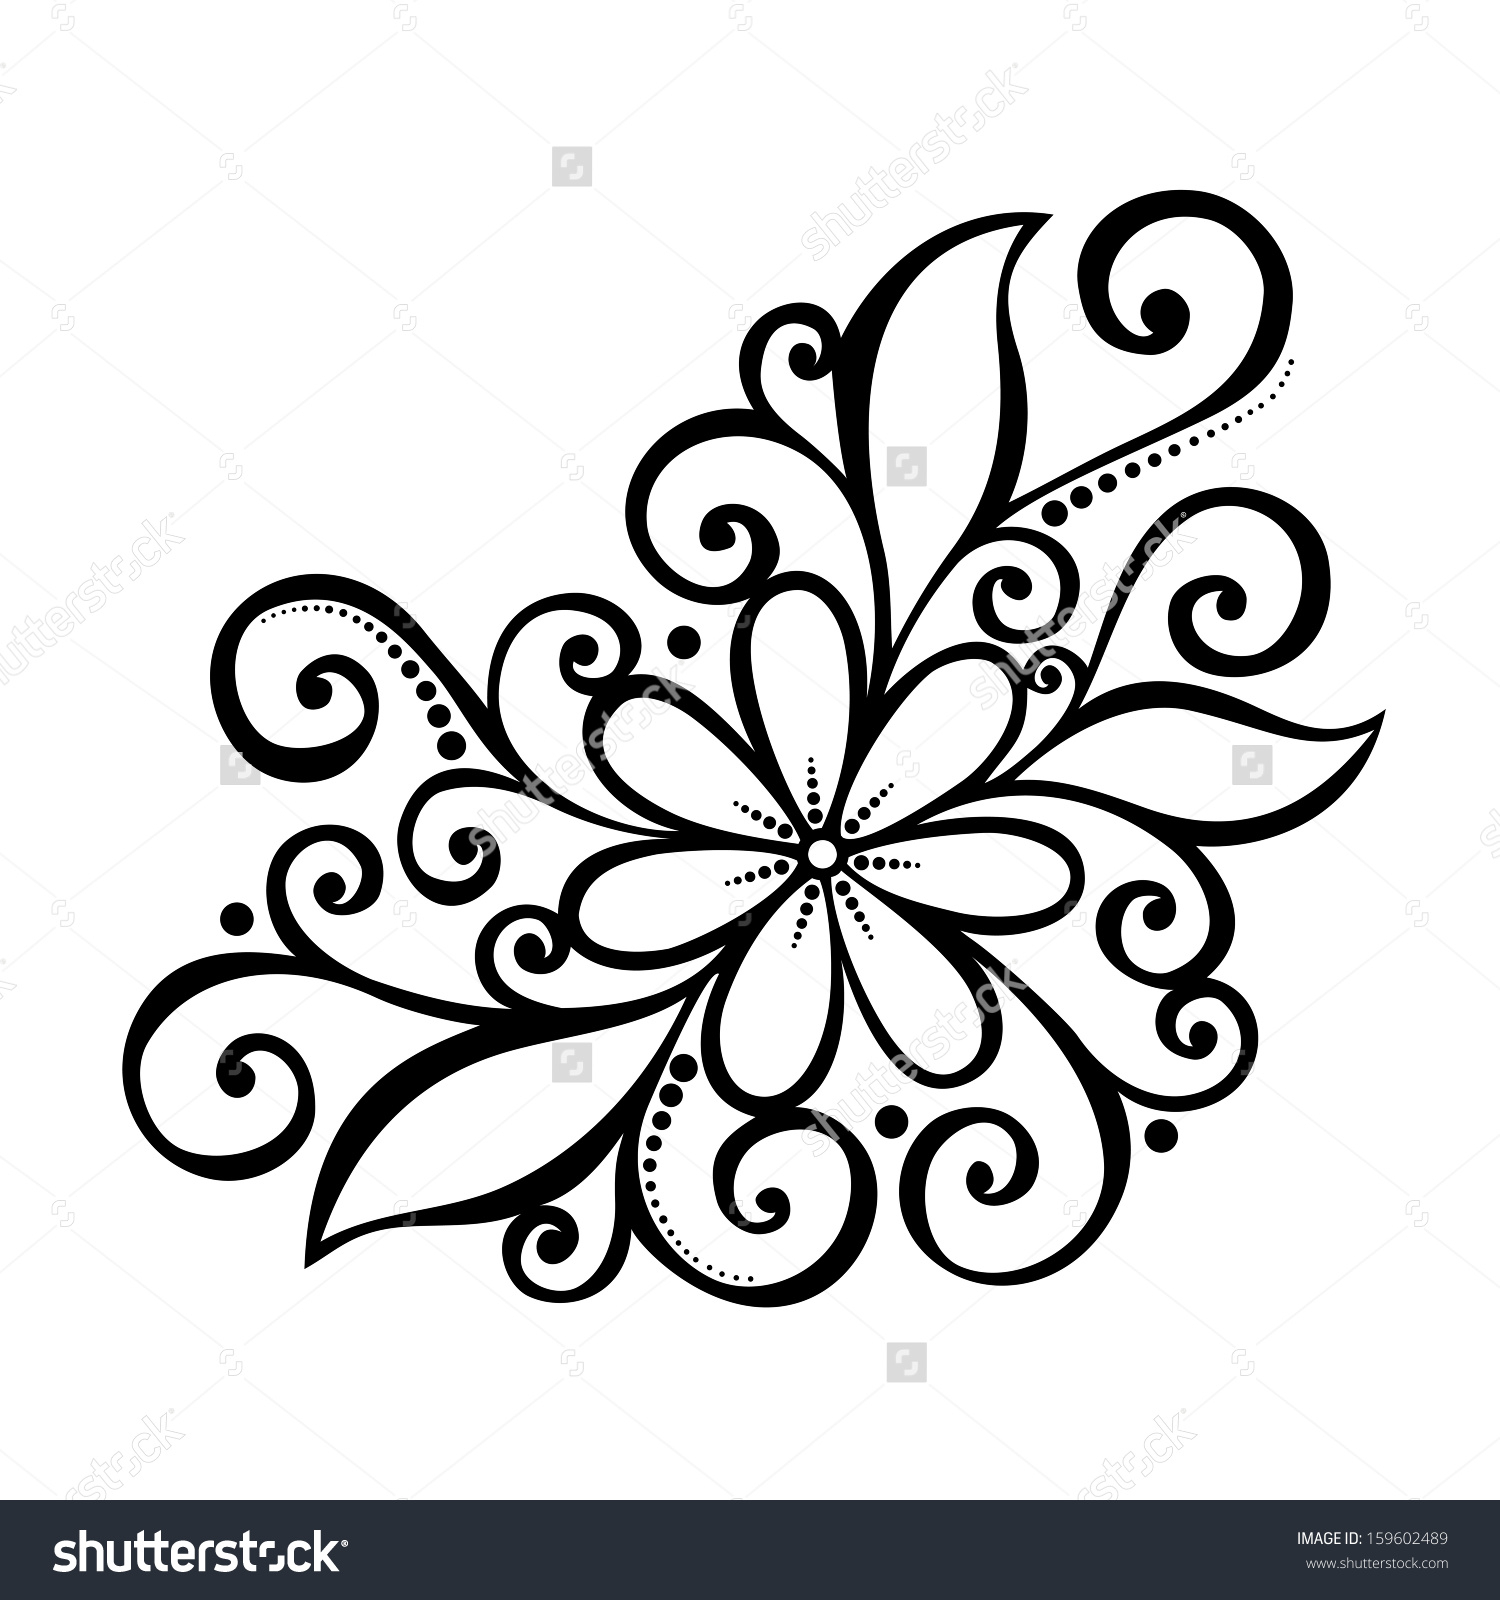 1500x1600 Best Flower Design For Drawing [ Flower Designing ] Flower